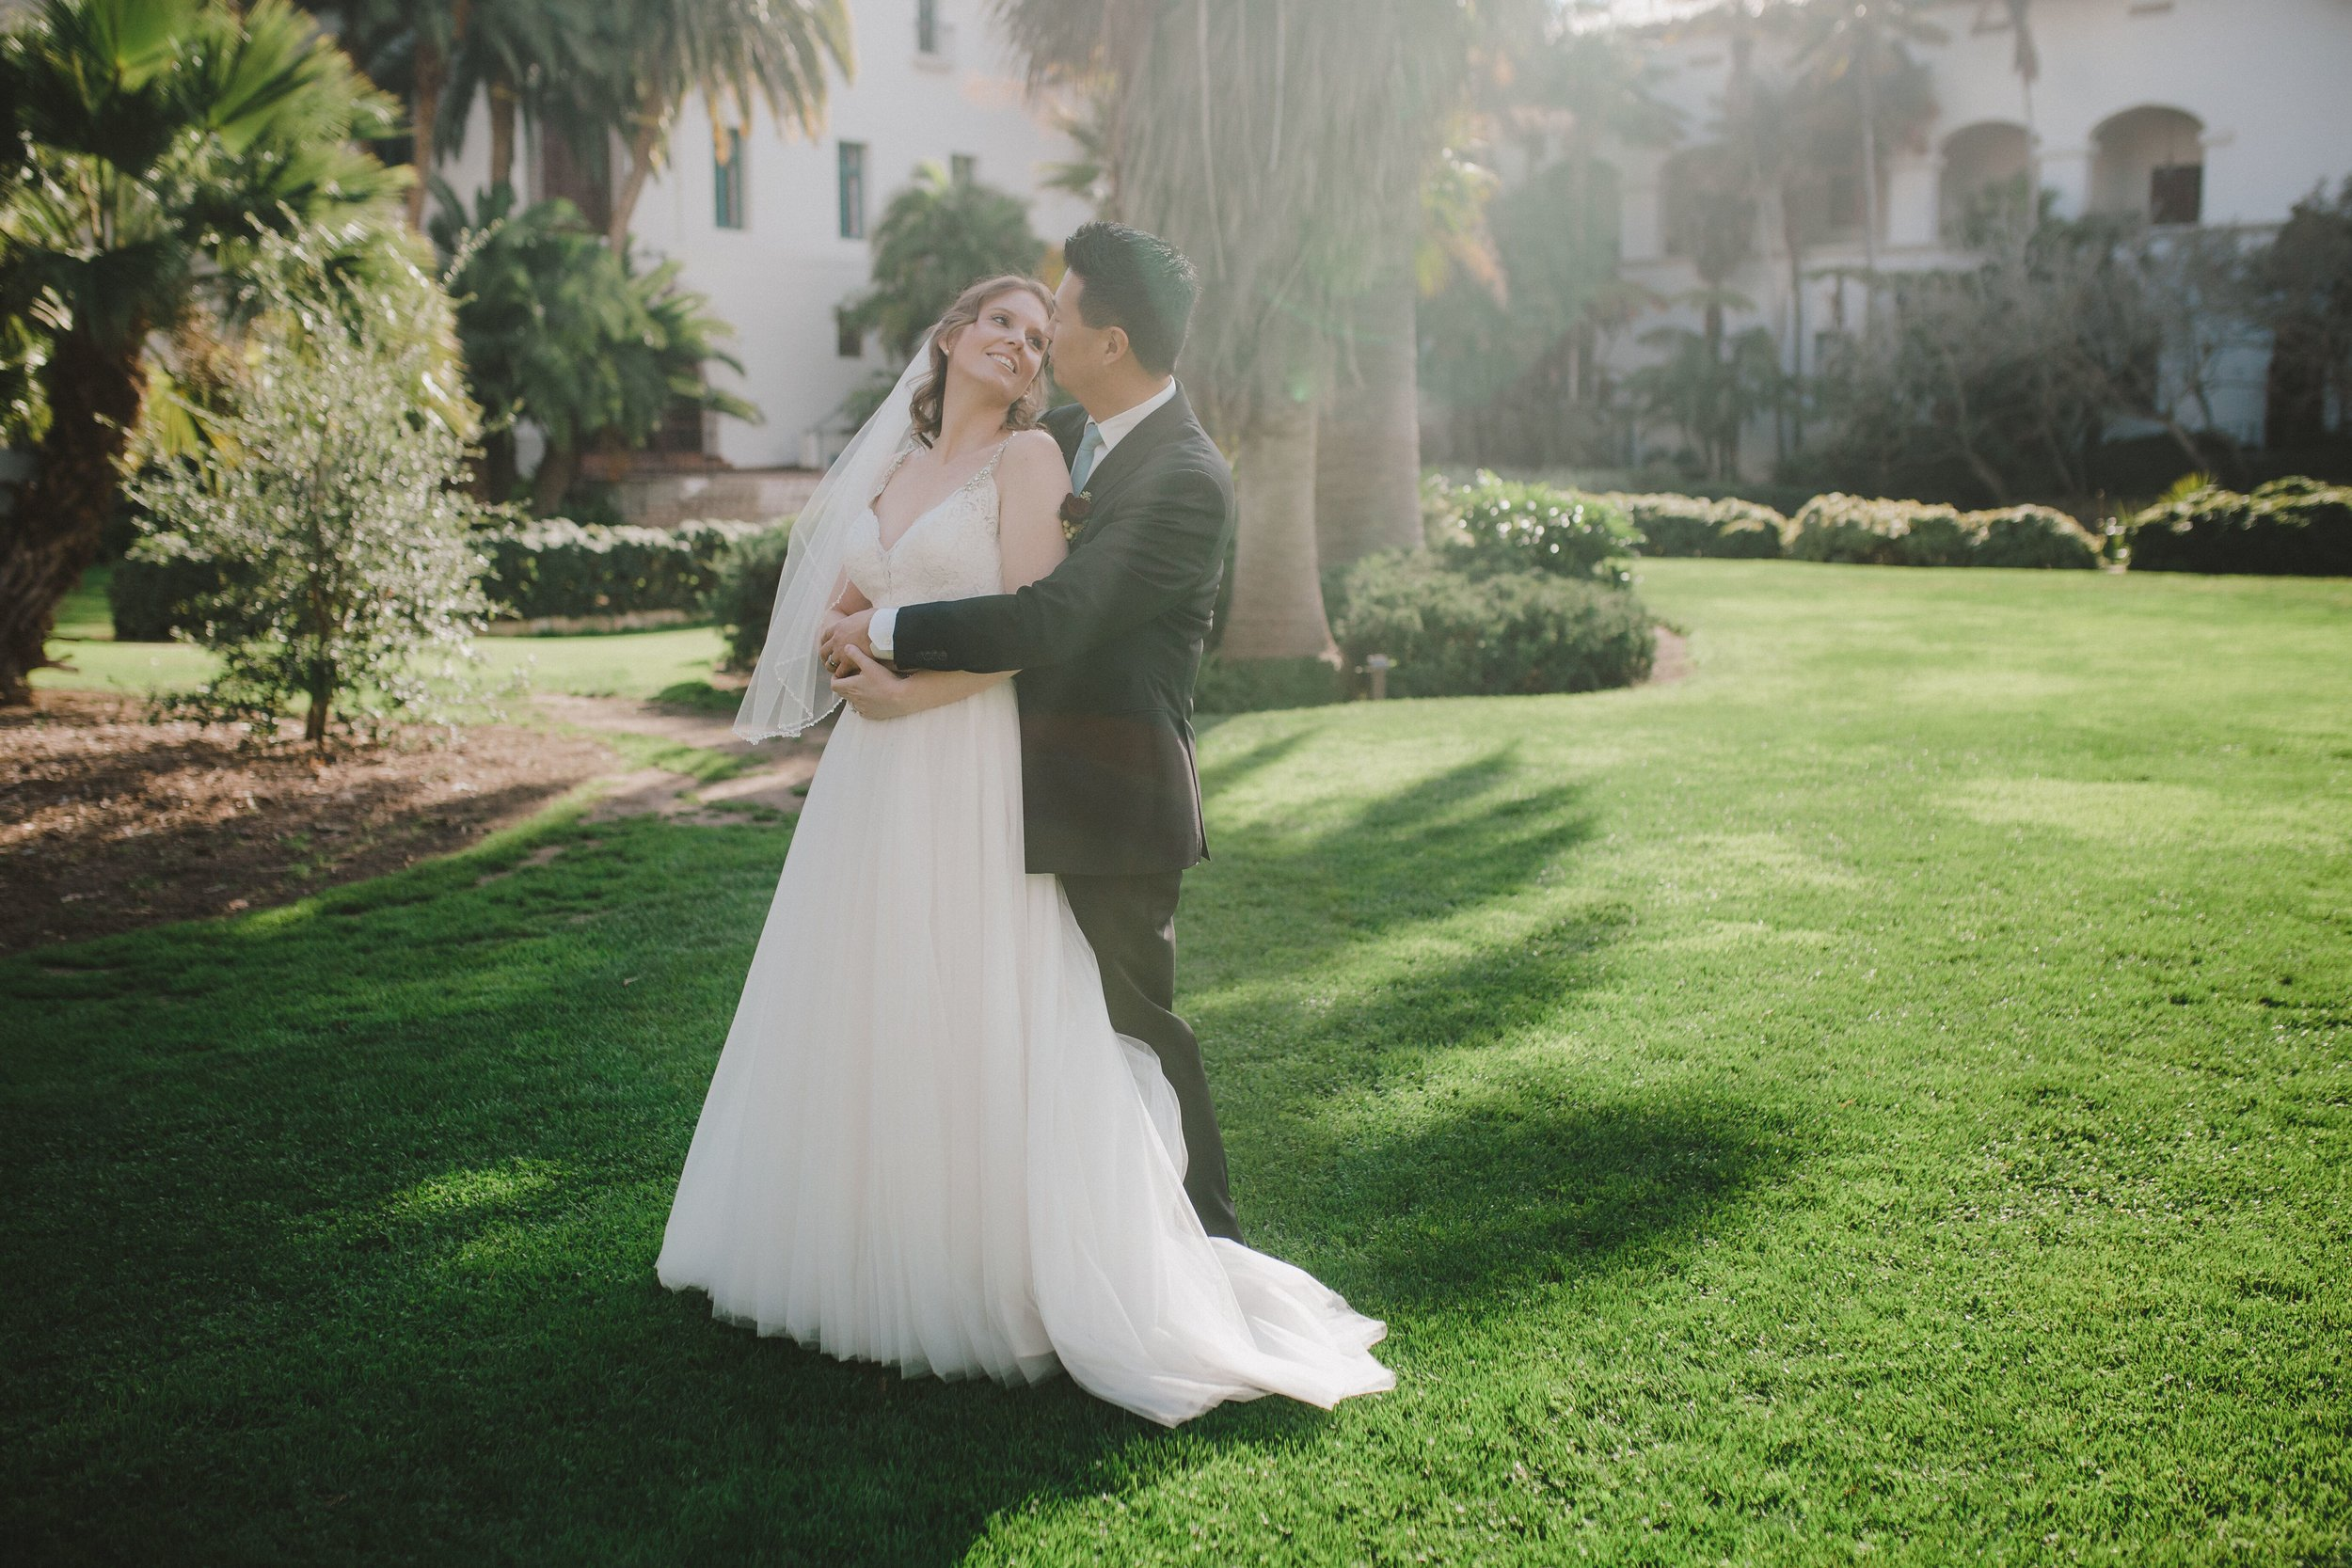 www.santabarbawedding.com | Venue: Santa Barbara Courthouse | Photography: Ryanne Bee Photography | Officiant: Santa Barbara Classic Weddings | Bride and Groom Embrace